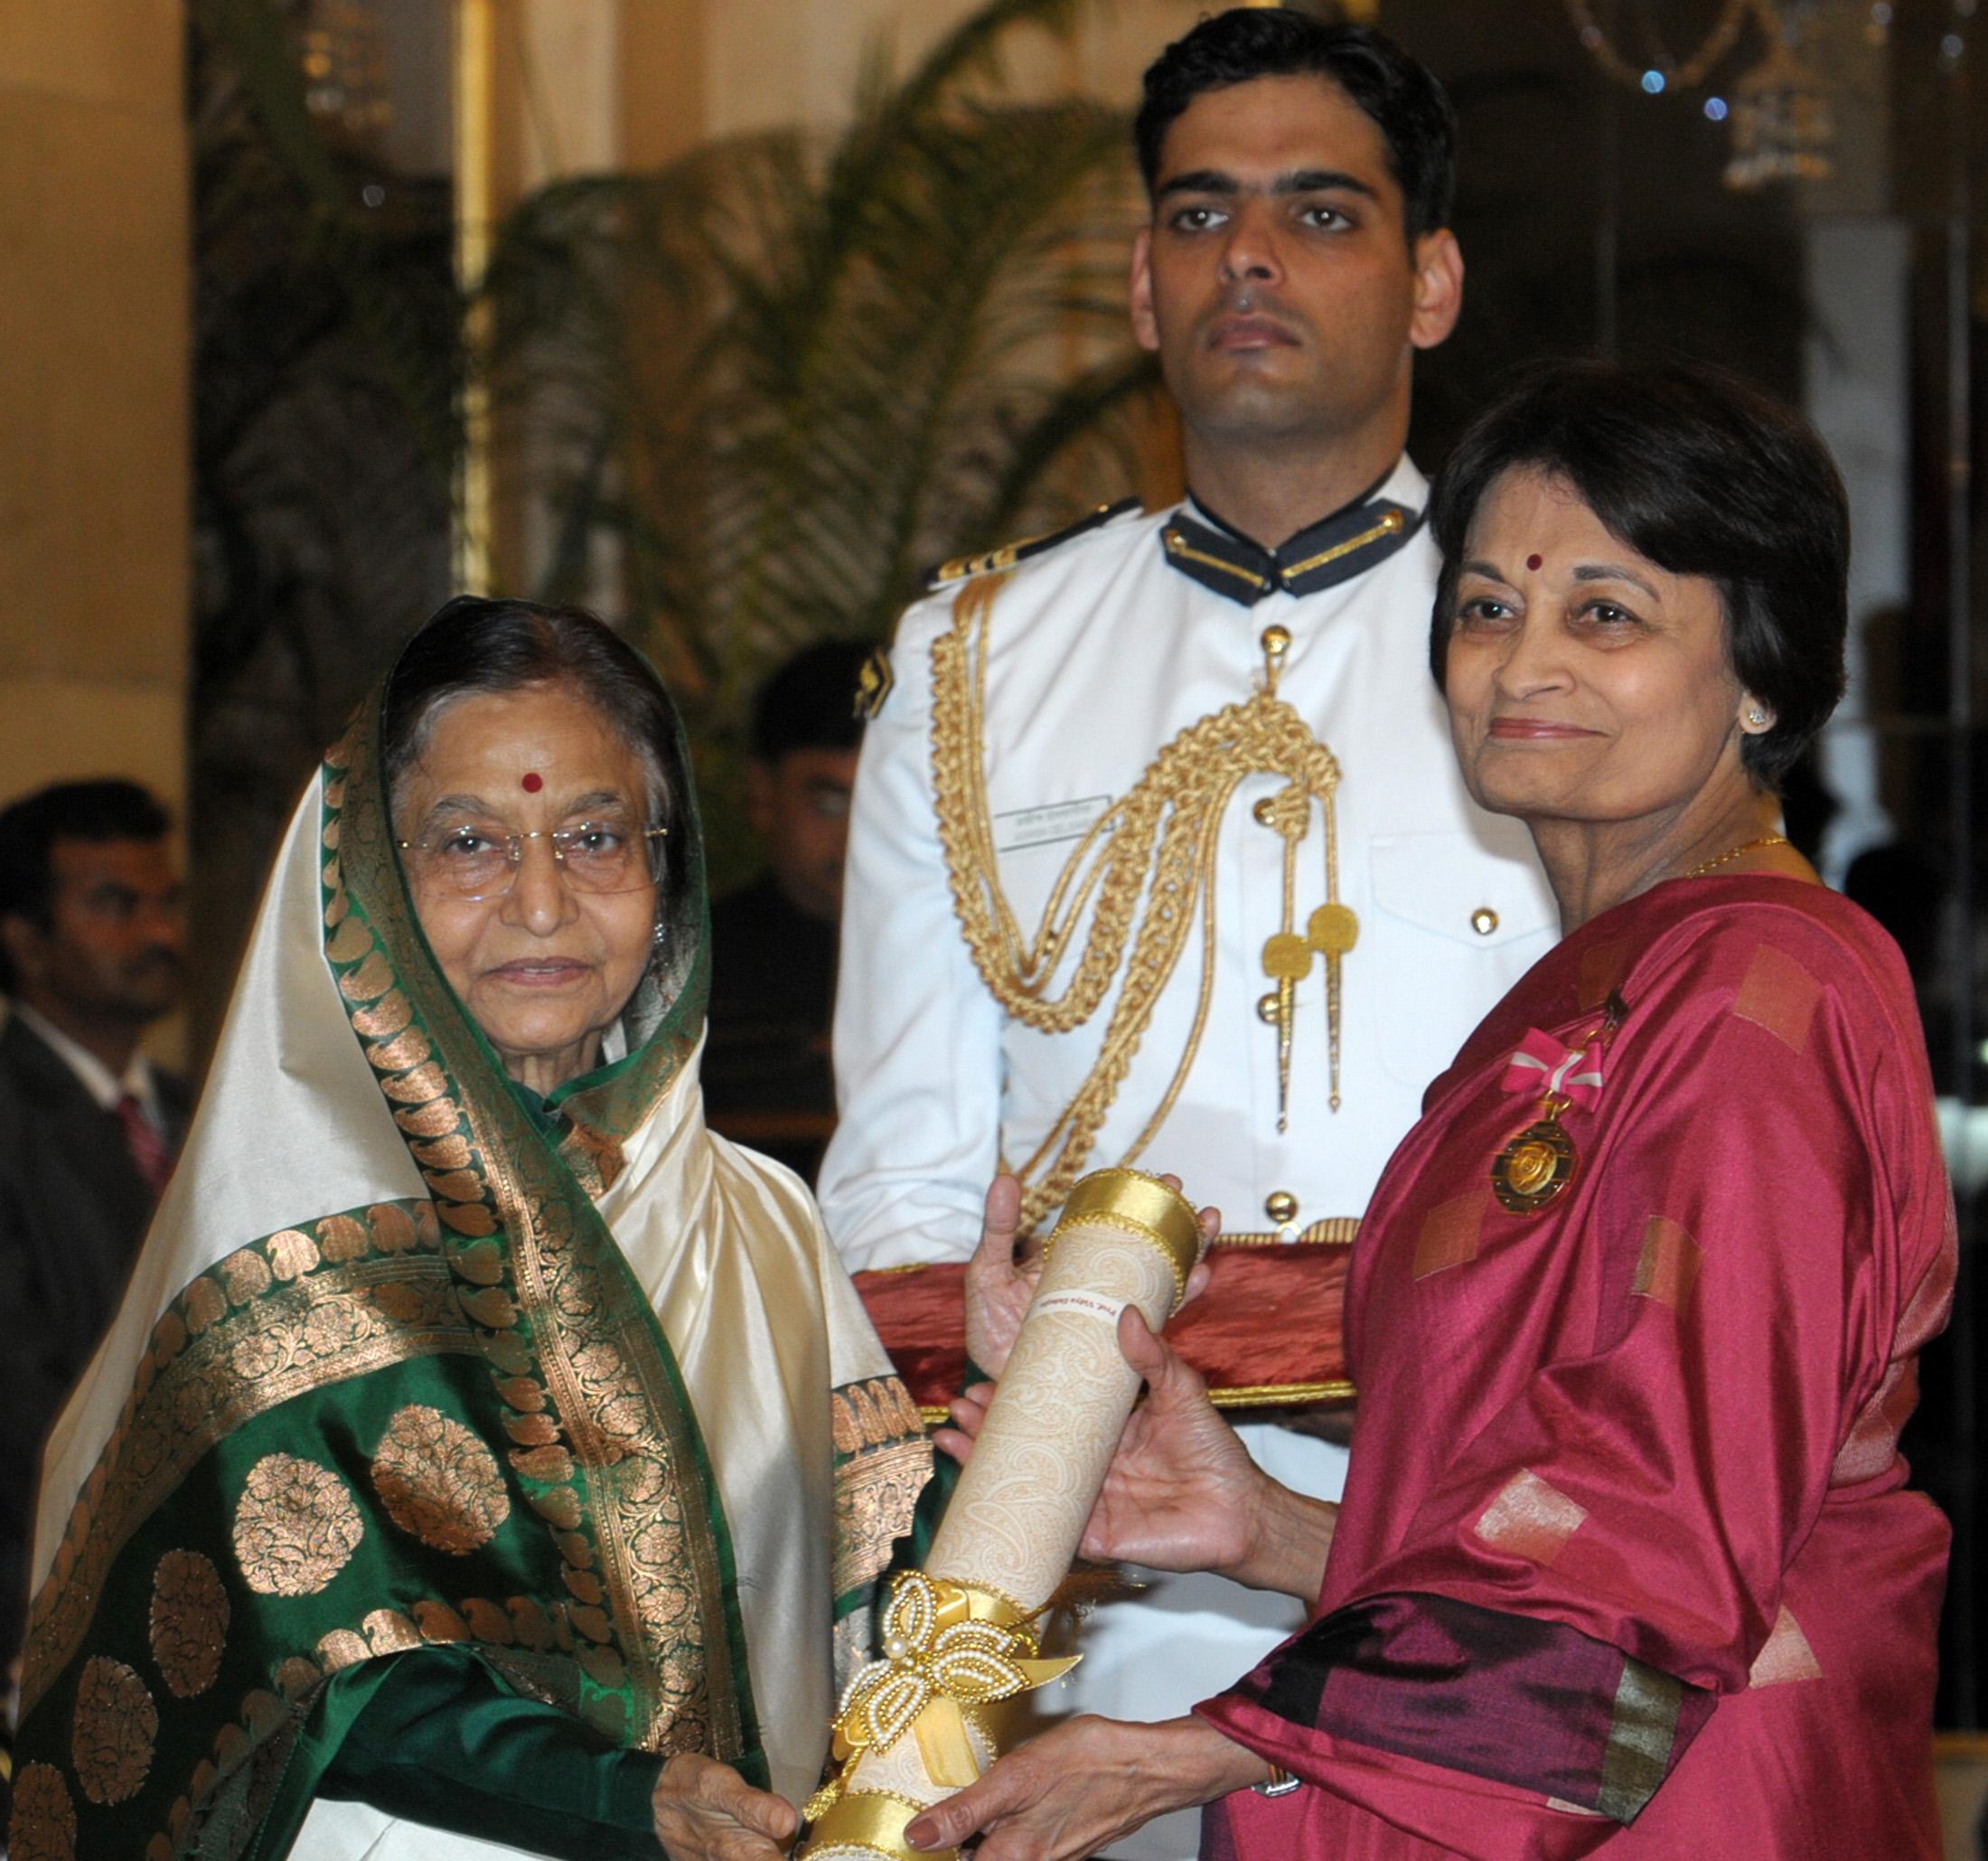 The President, Smt. [[Pratibha Devisingh Patil]] presenting the Padma Bhushan Award to Prof. Vidya Dehejia, 2012